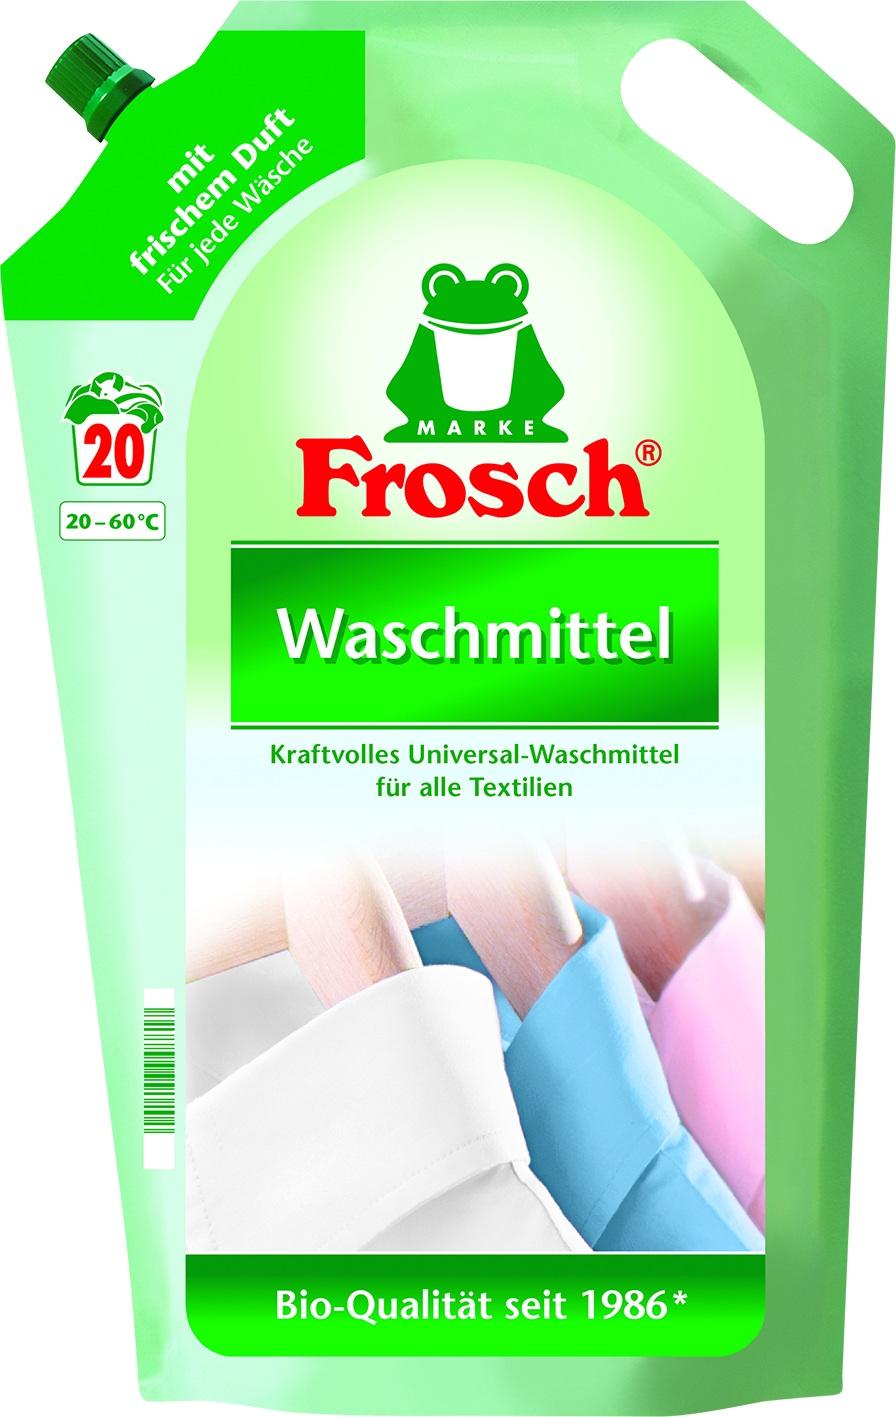 Waschmittel btl